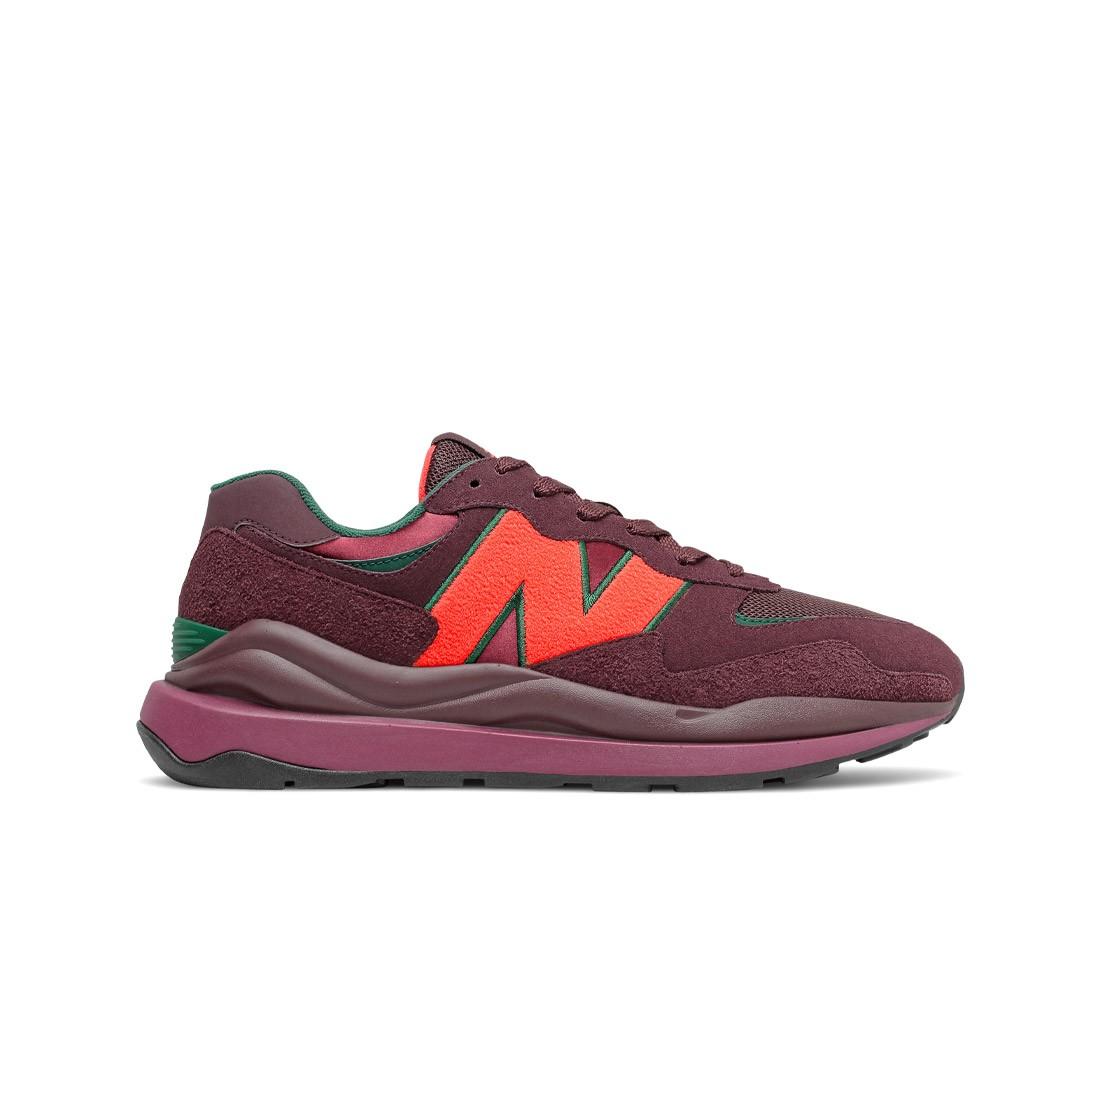 New Balance Women 57/40 W5740WA1 (burgundy / garnet / pink glo)